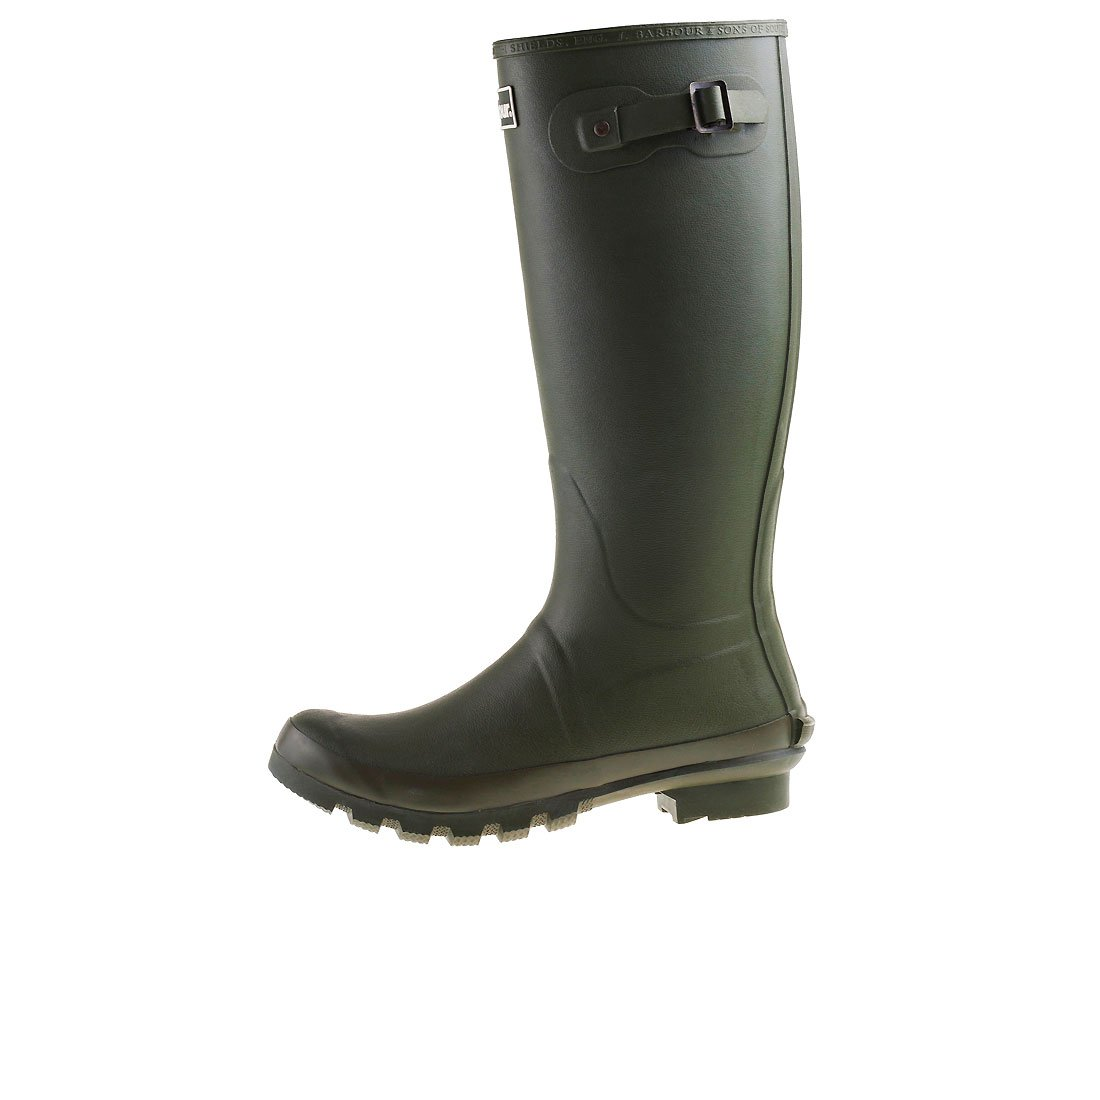 701d3601 Mens Barbour Bede Winter Mid Calf Snow Waterproof Rain Wellington Boots  larger image